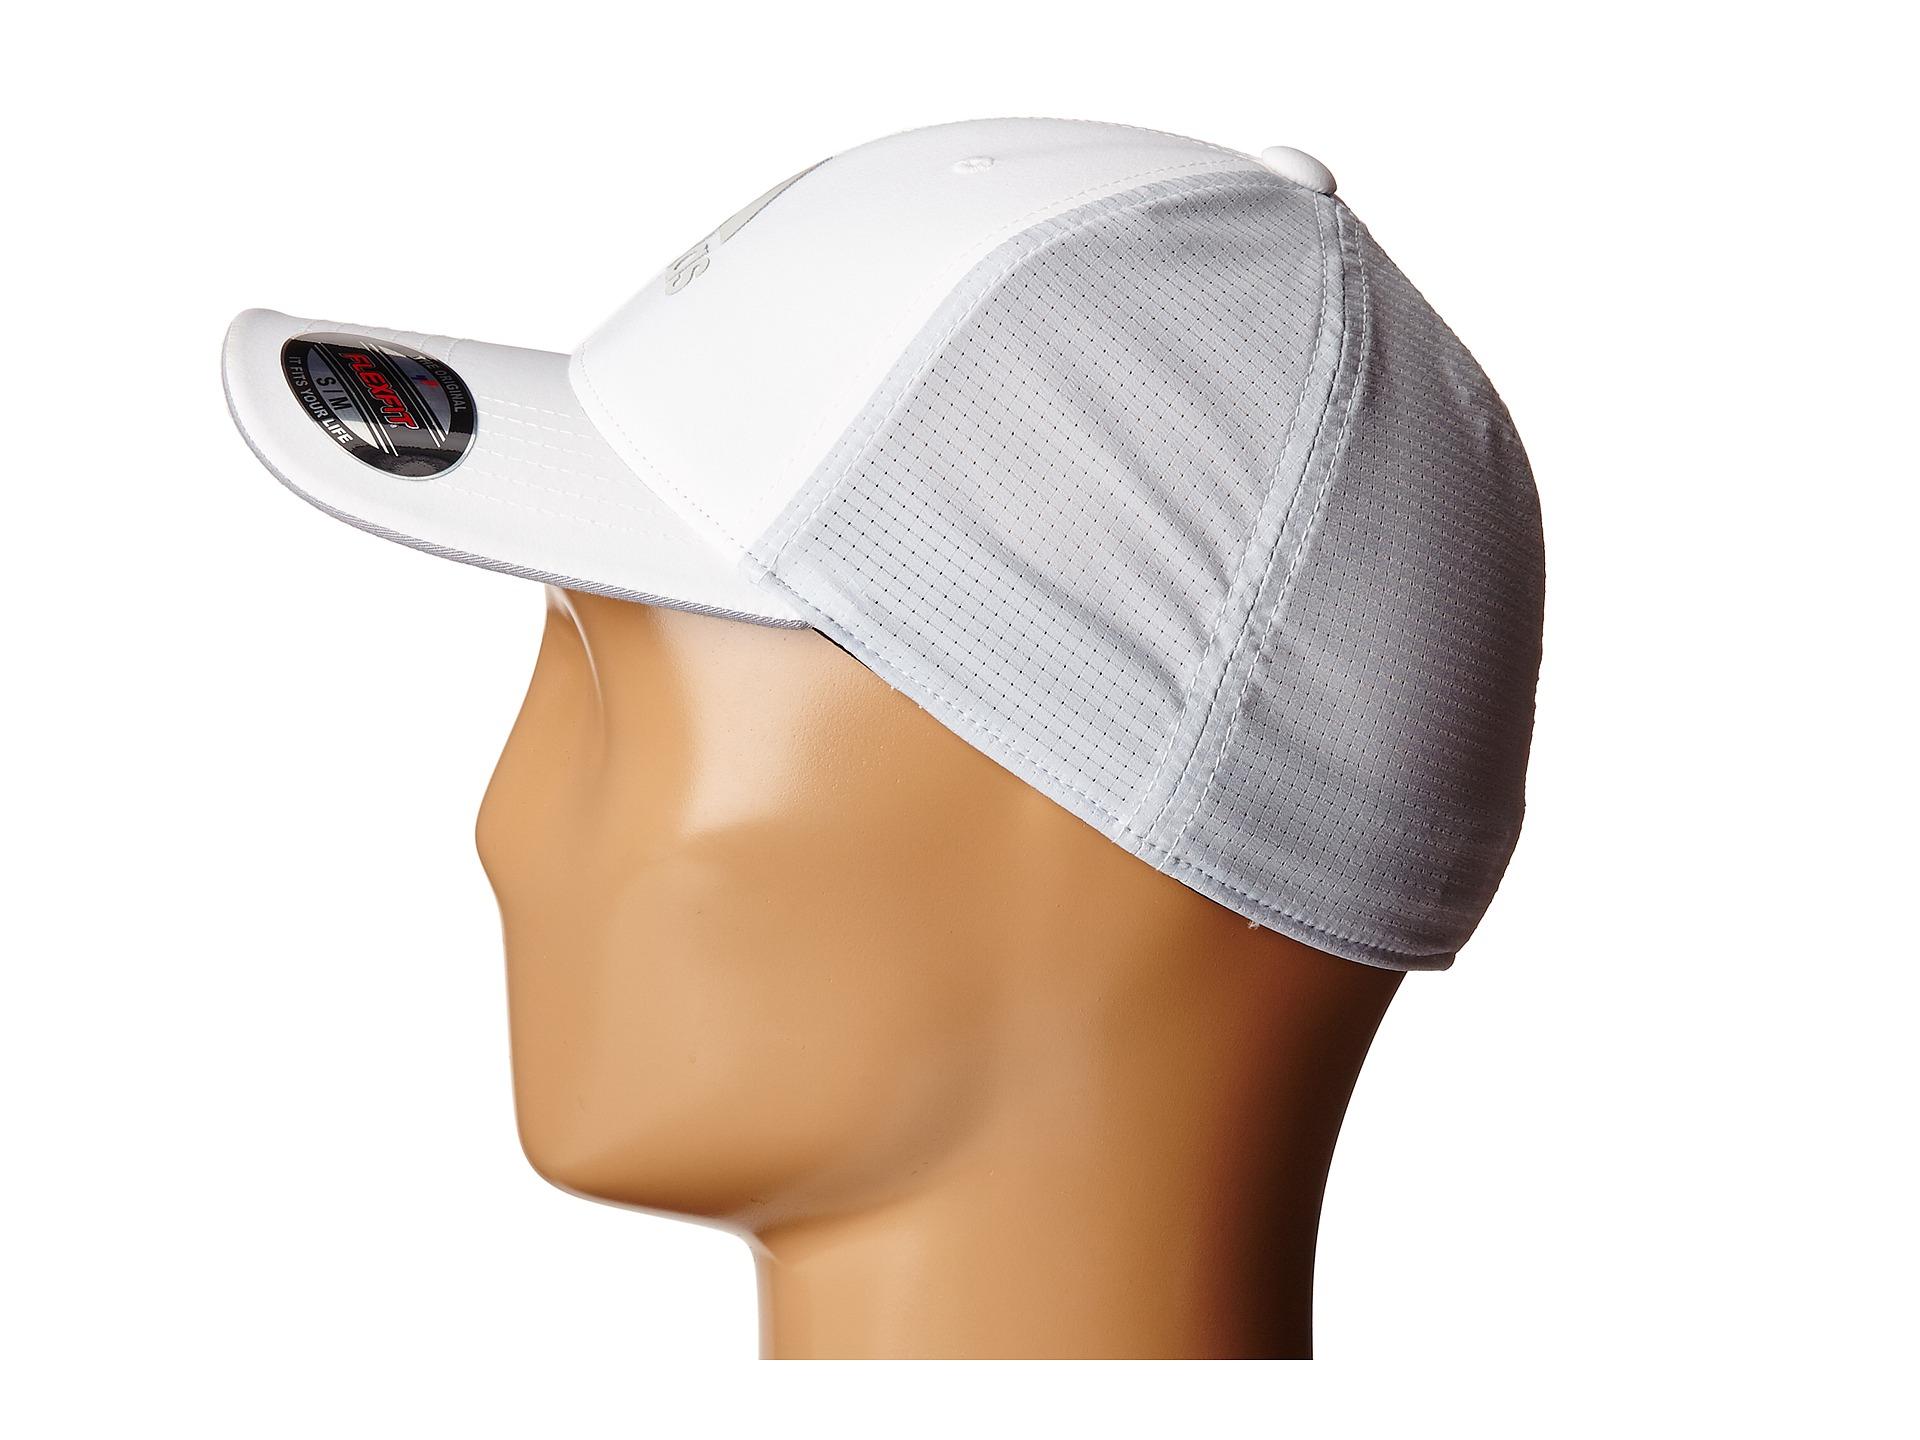 Lyst - adidas Originals Lightweight Climacool® Flexfit Hat in White ... 8dee0e602a3